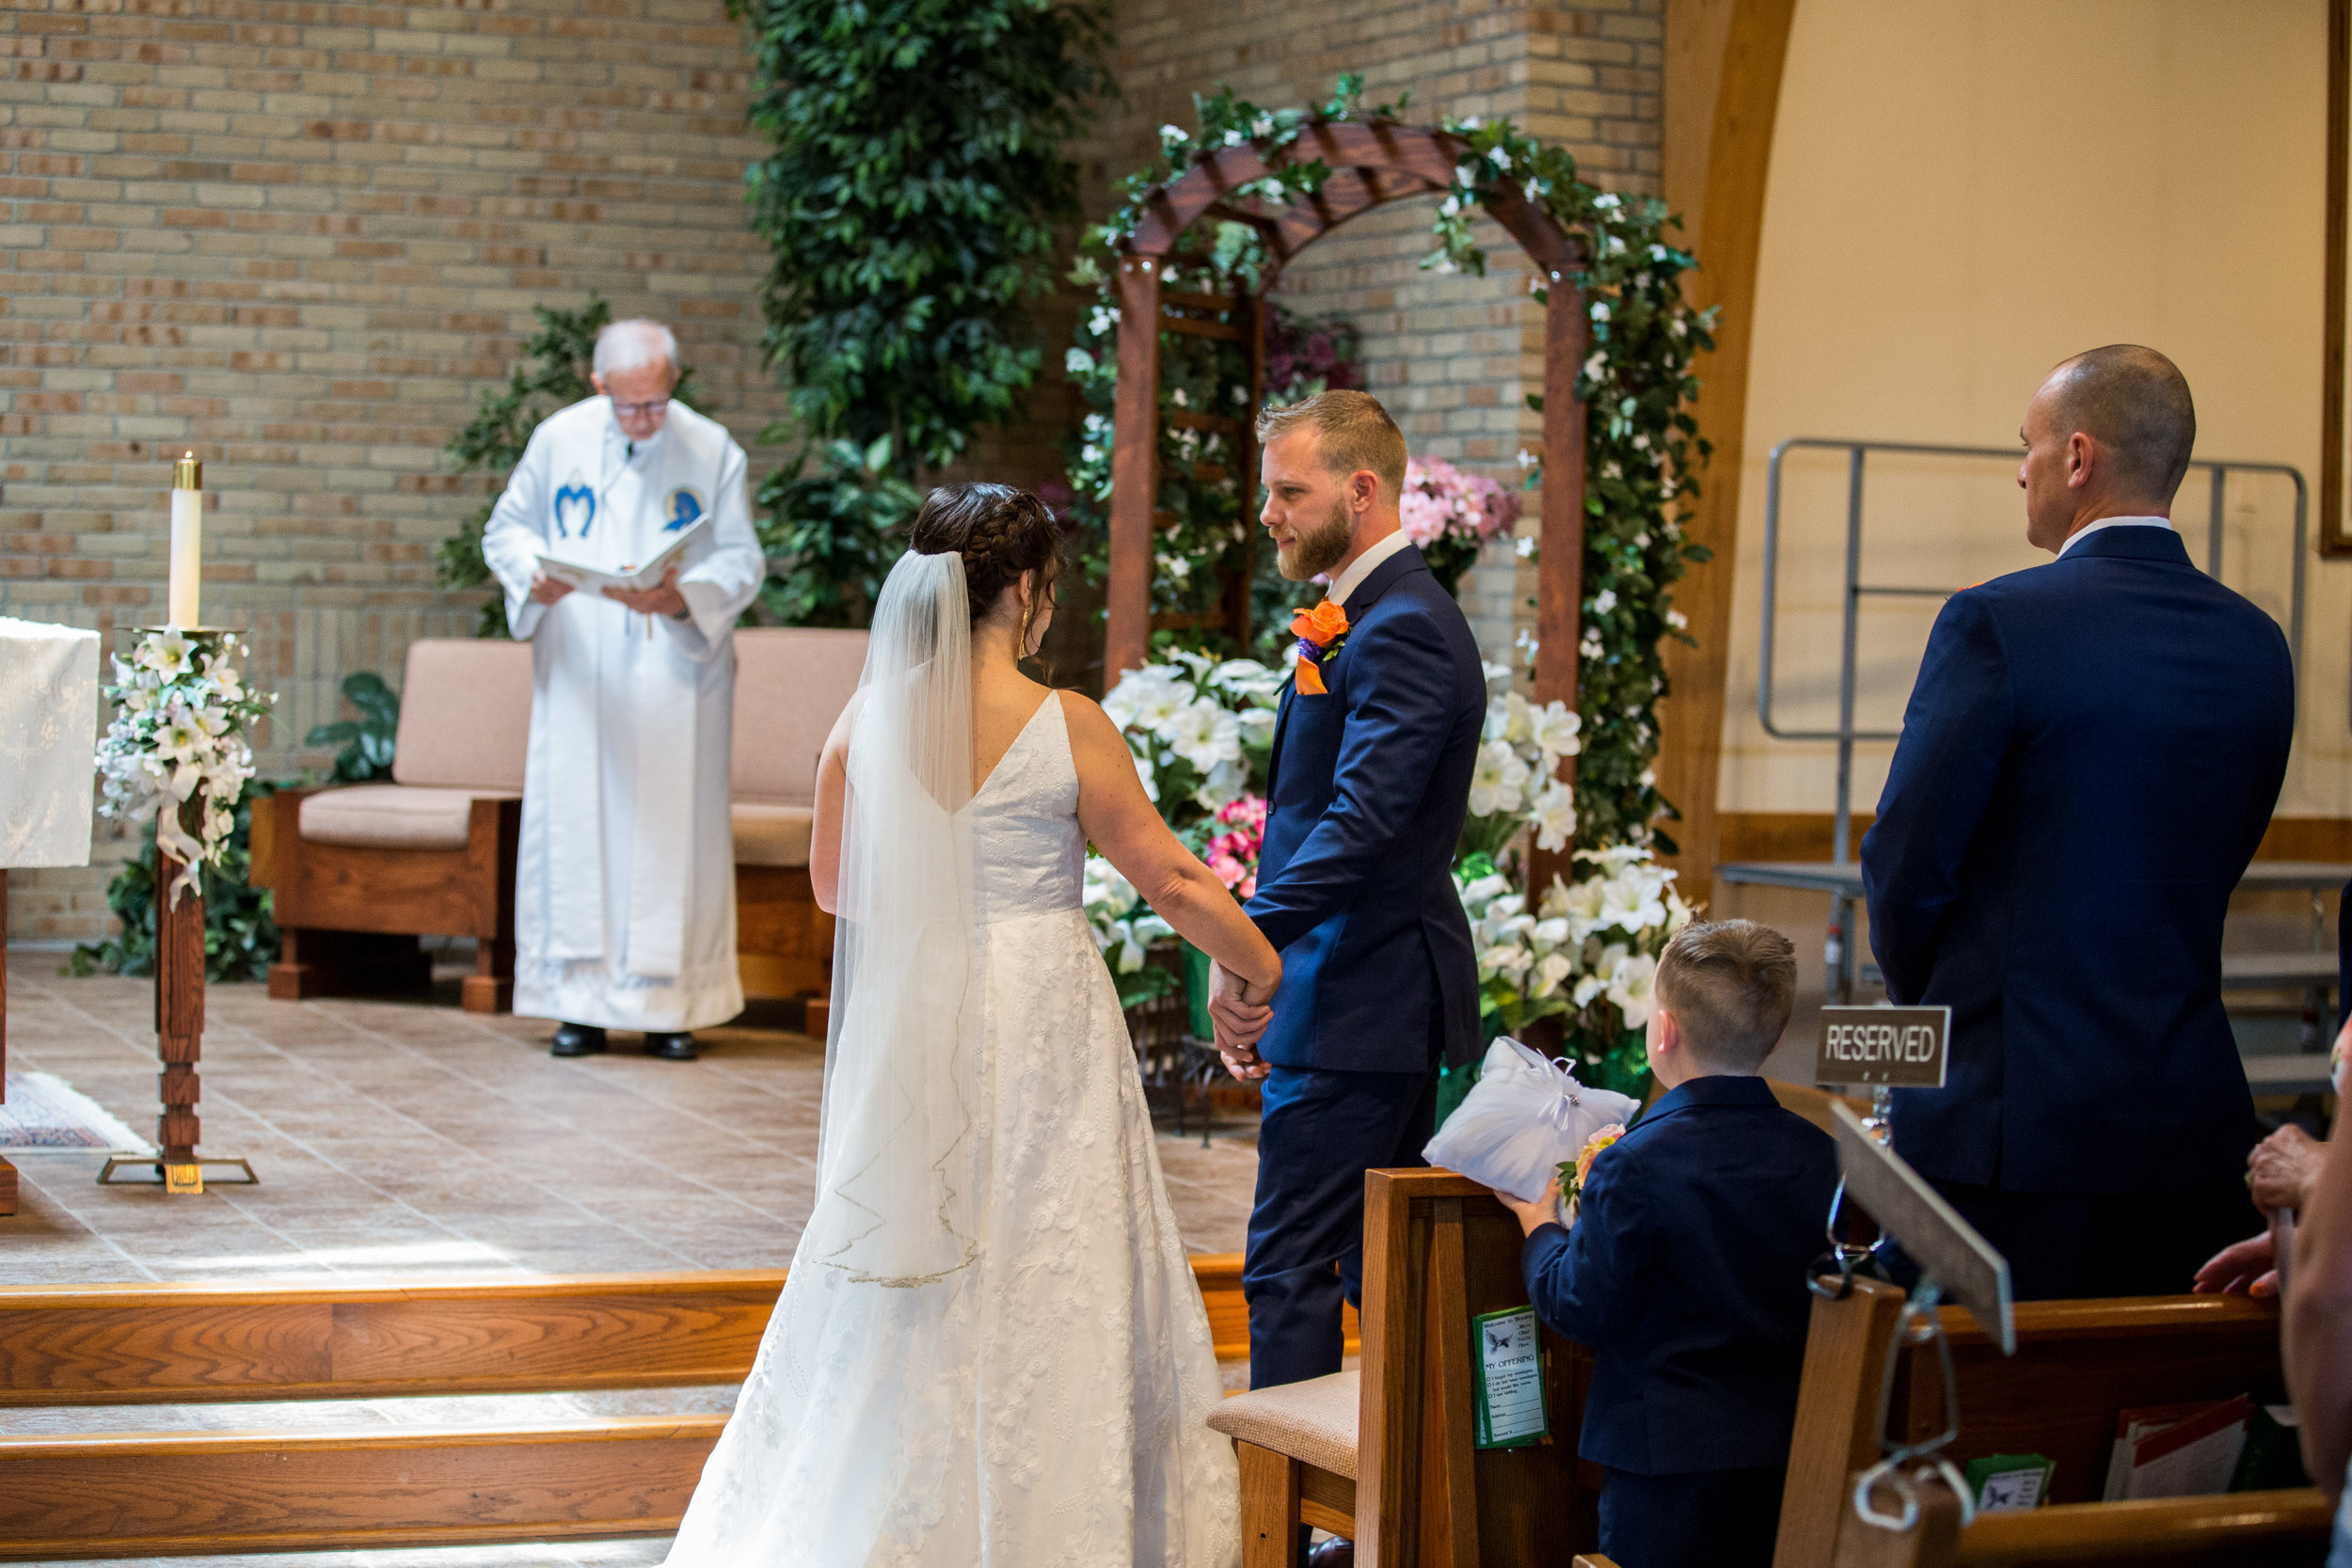 Natalie and Dallas Mooney Wedding 6-8-19_Tania Watt Photography-76.jpg